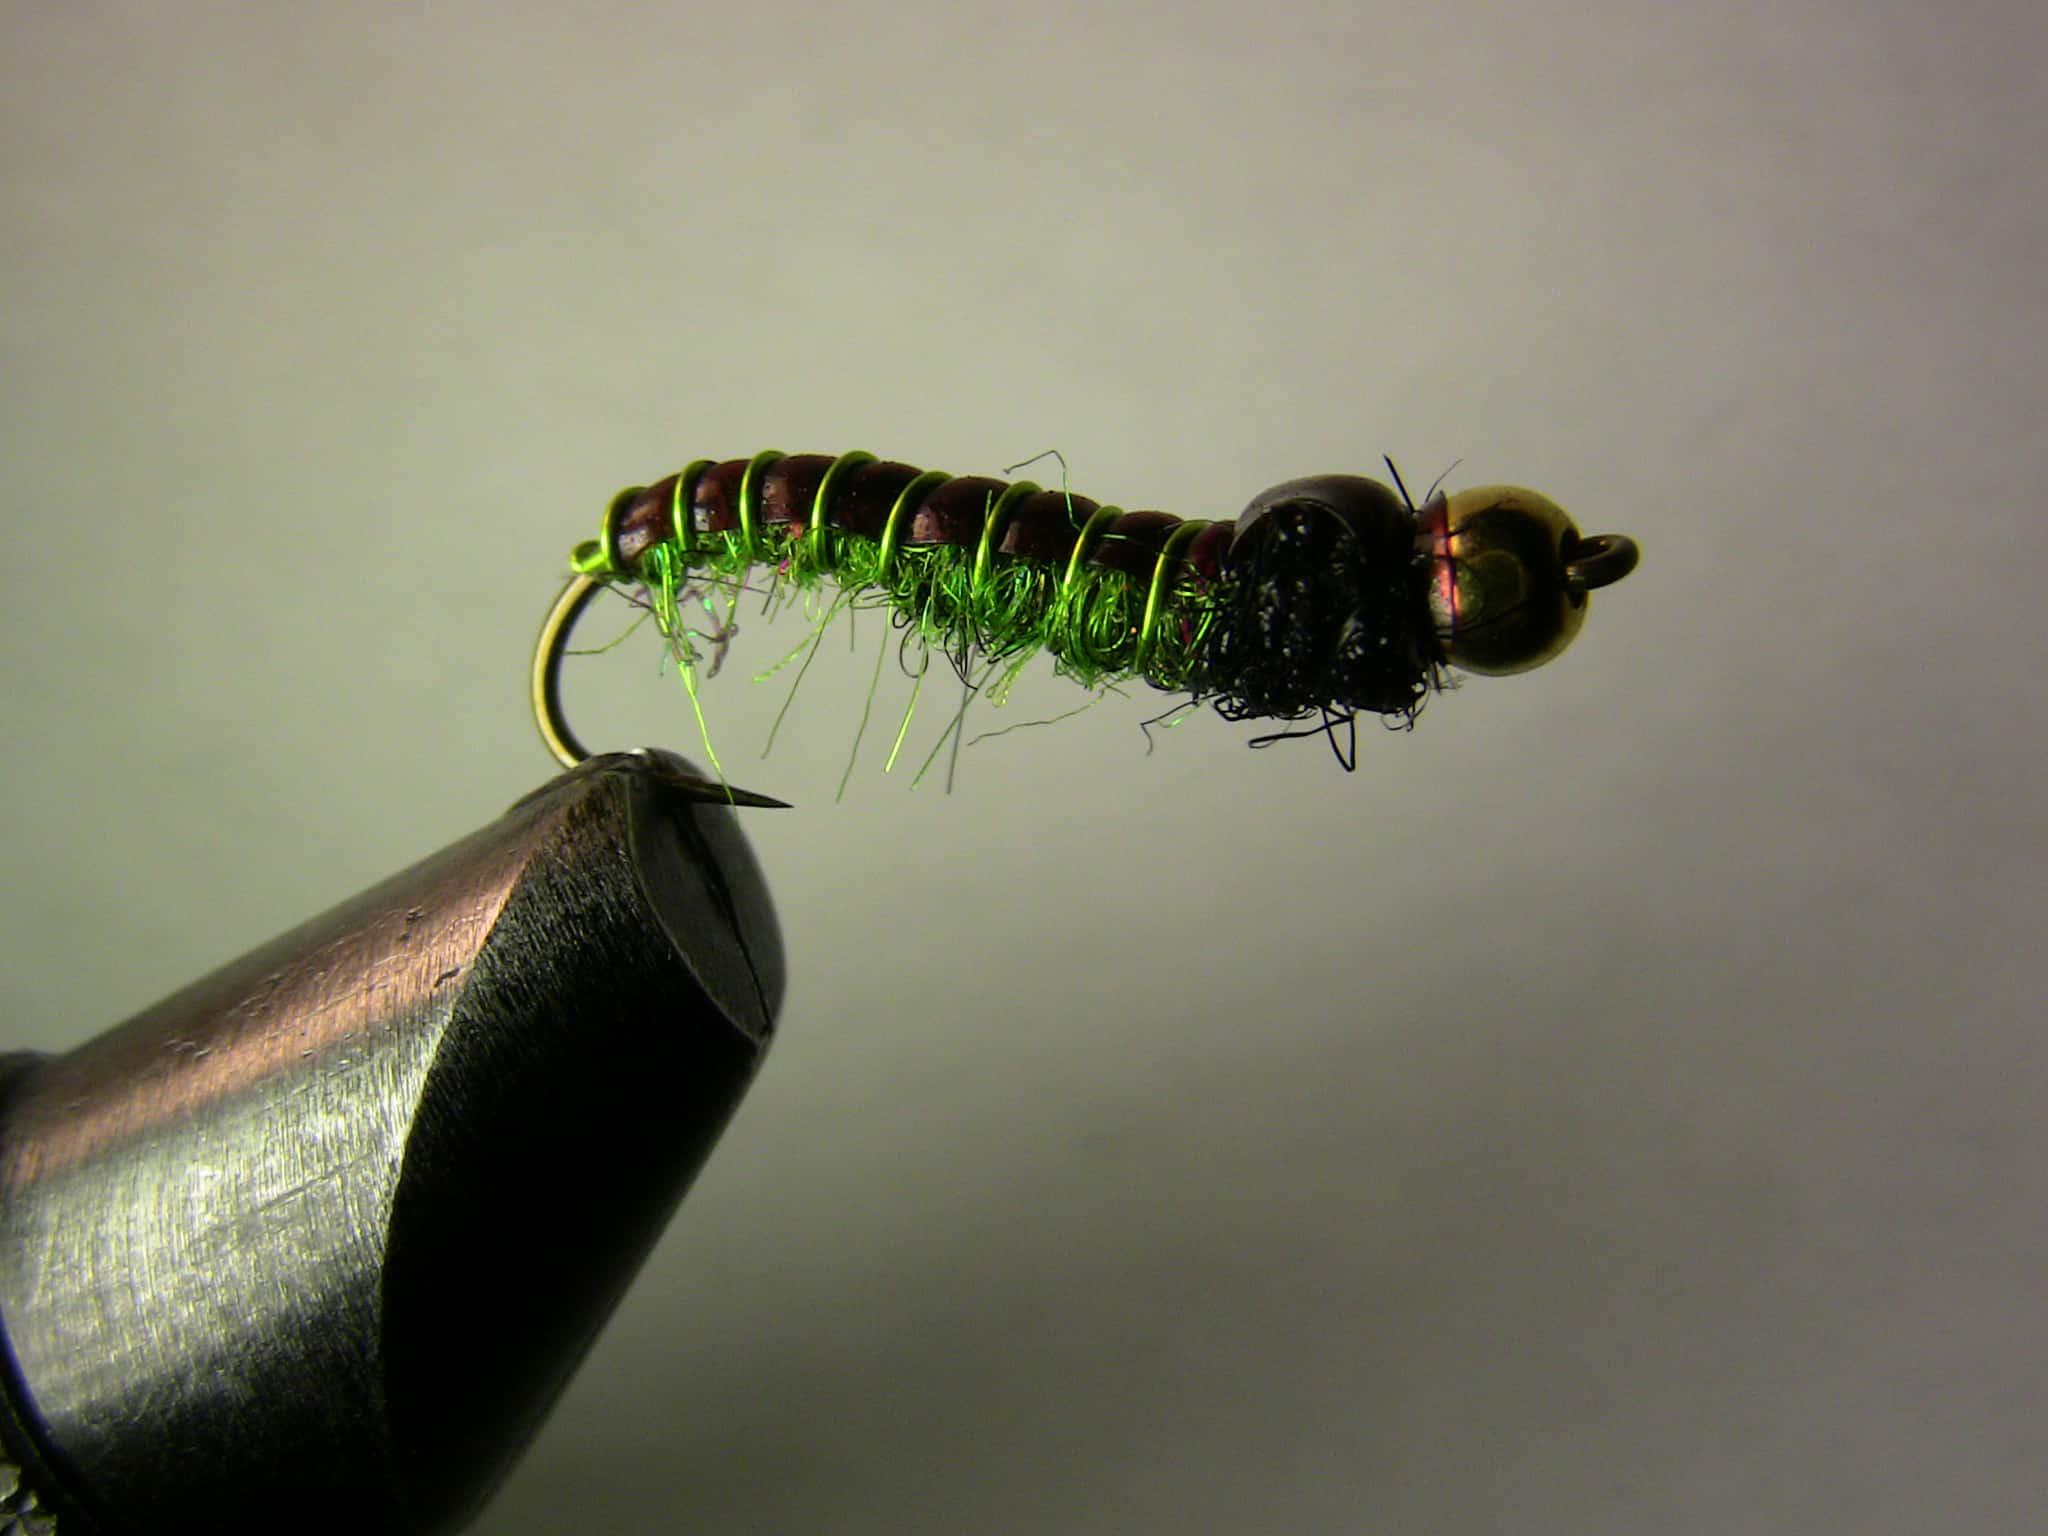 One of my favorite Green caddis larva patterns